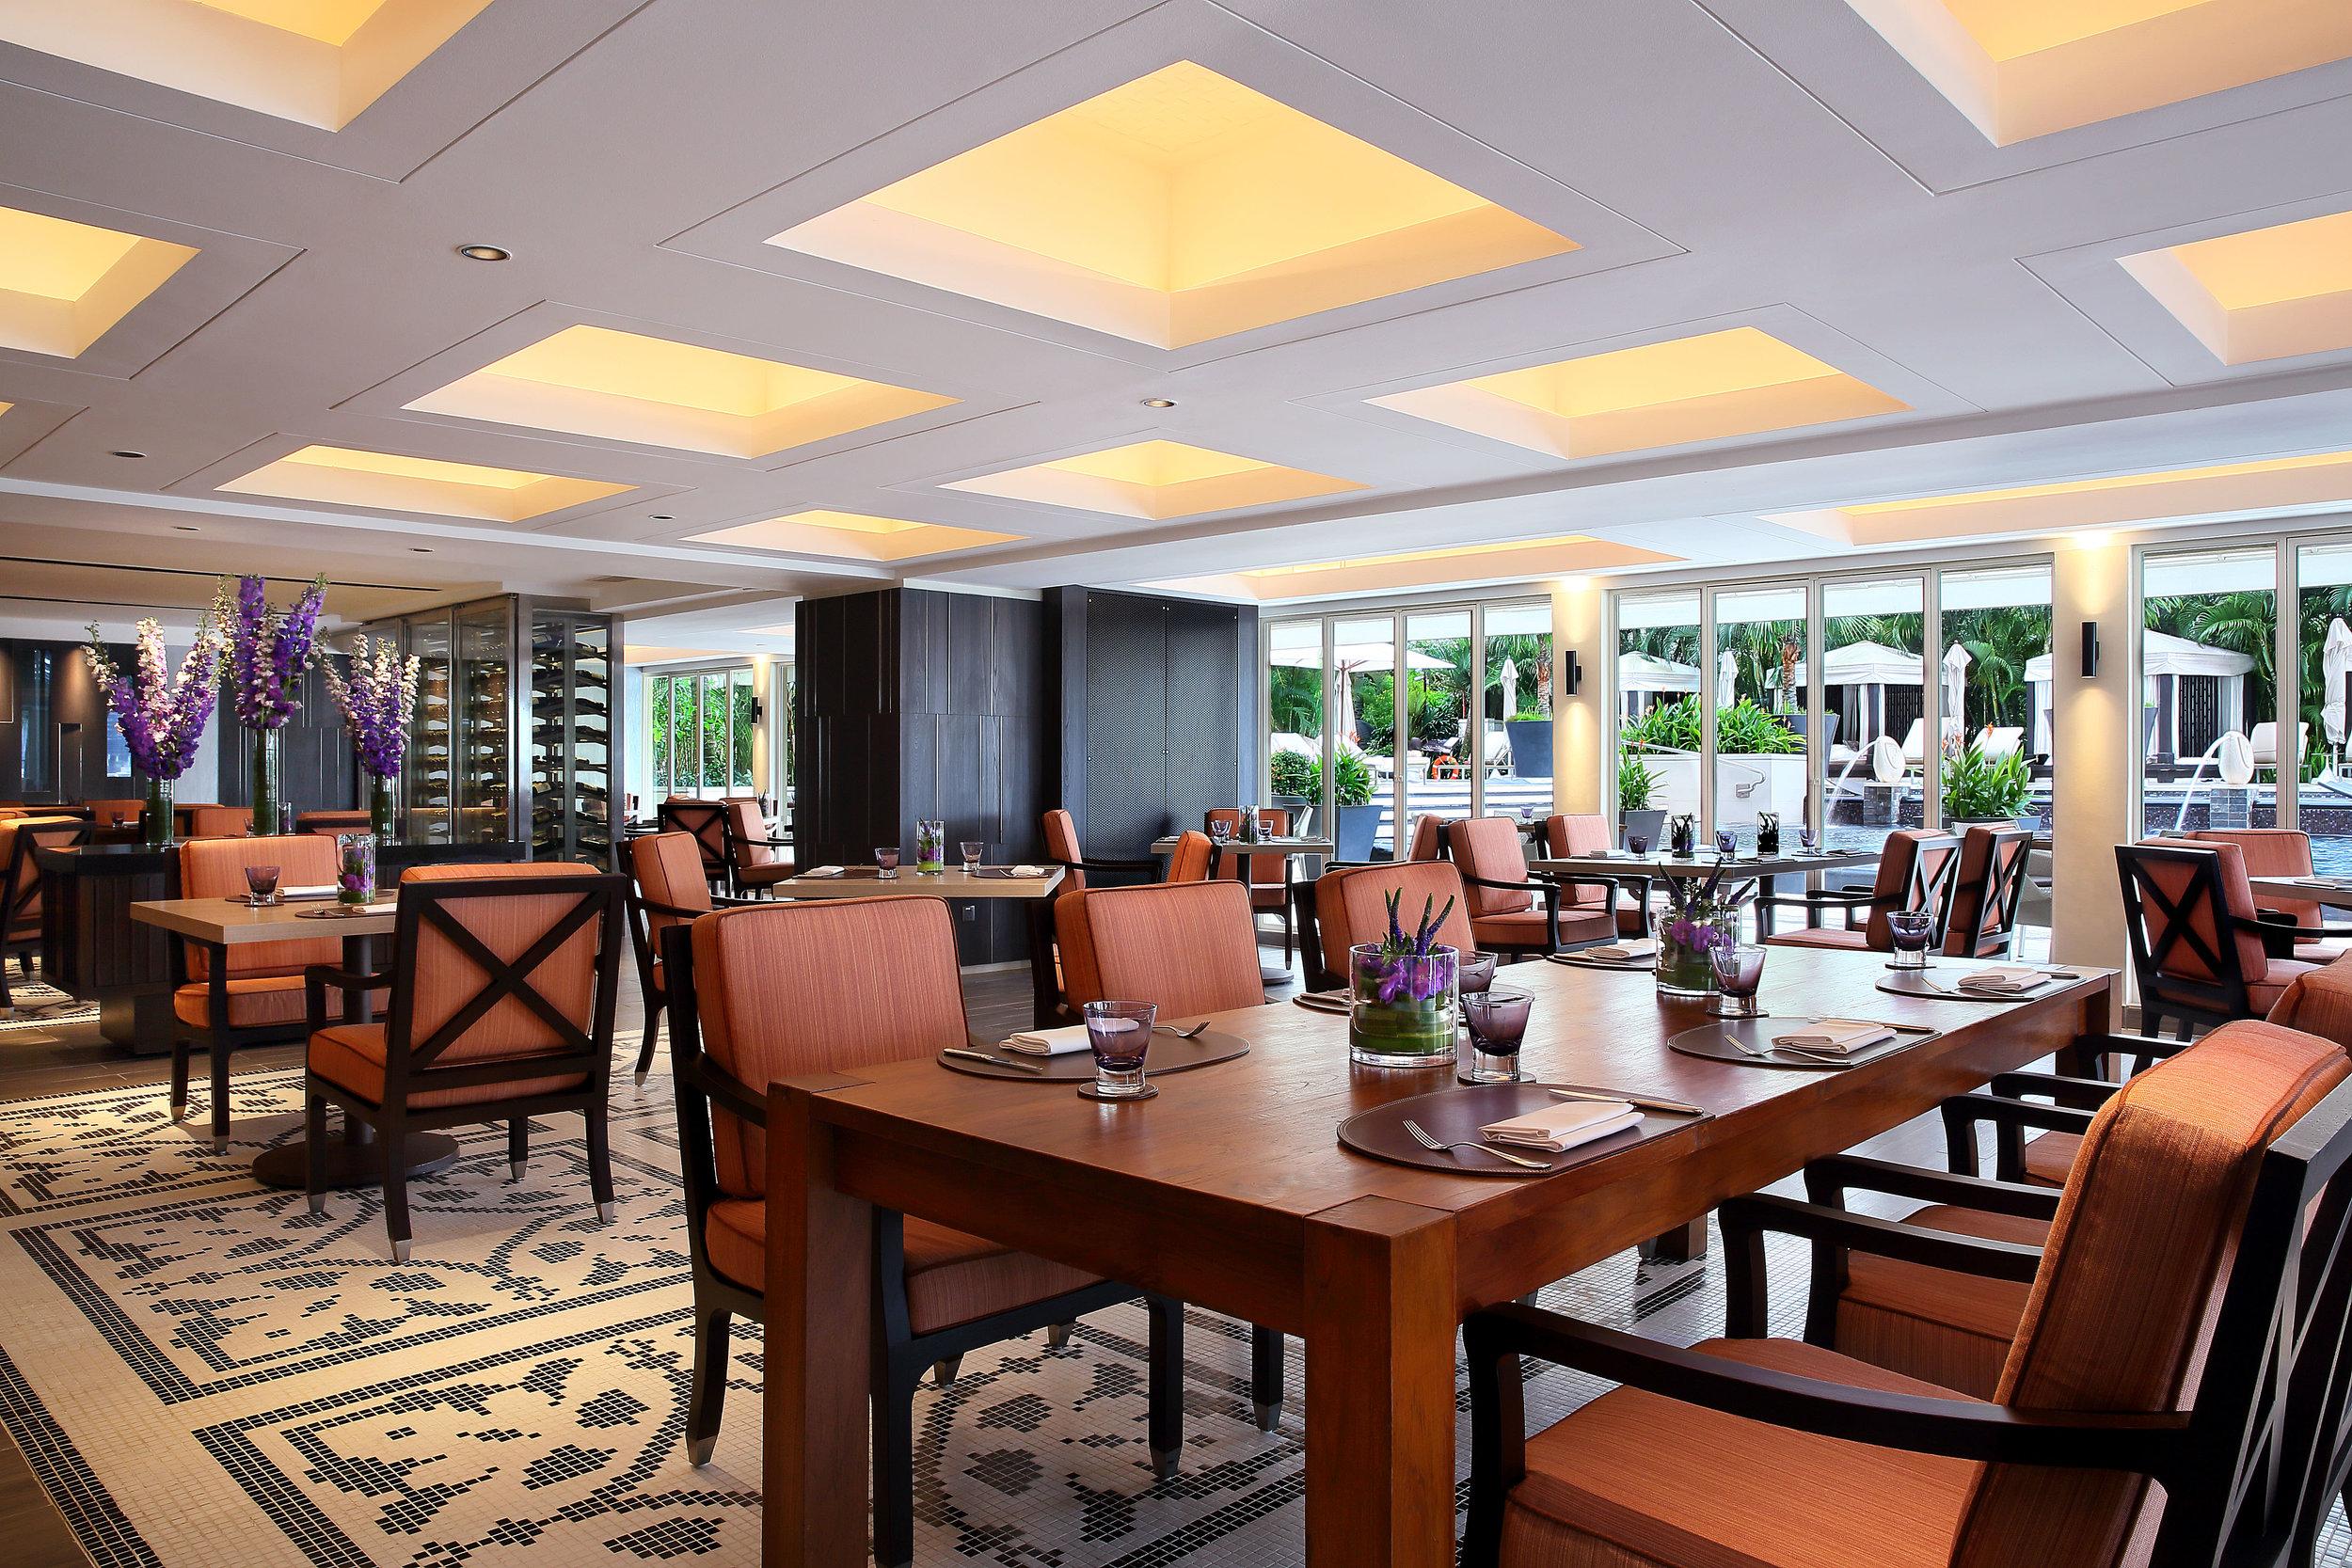 New Dolce Vita Interiors   Photo Credit: Mandarin Oriental, Singapore